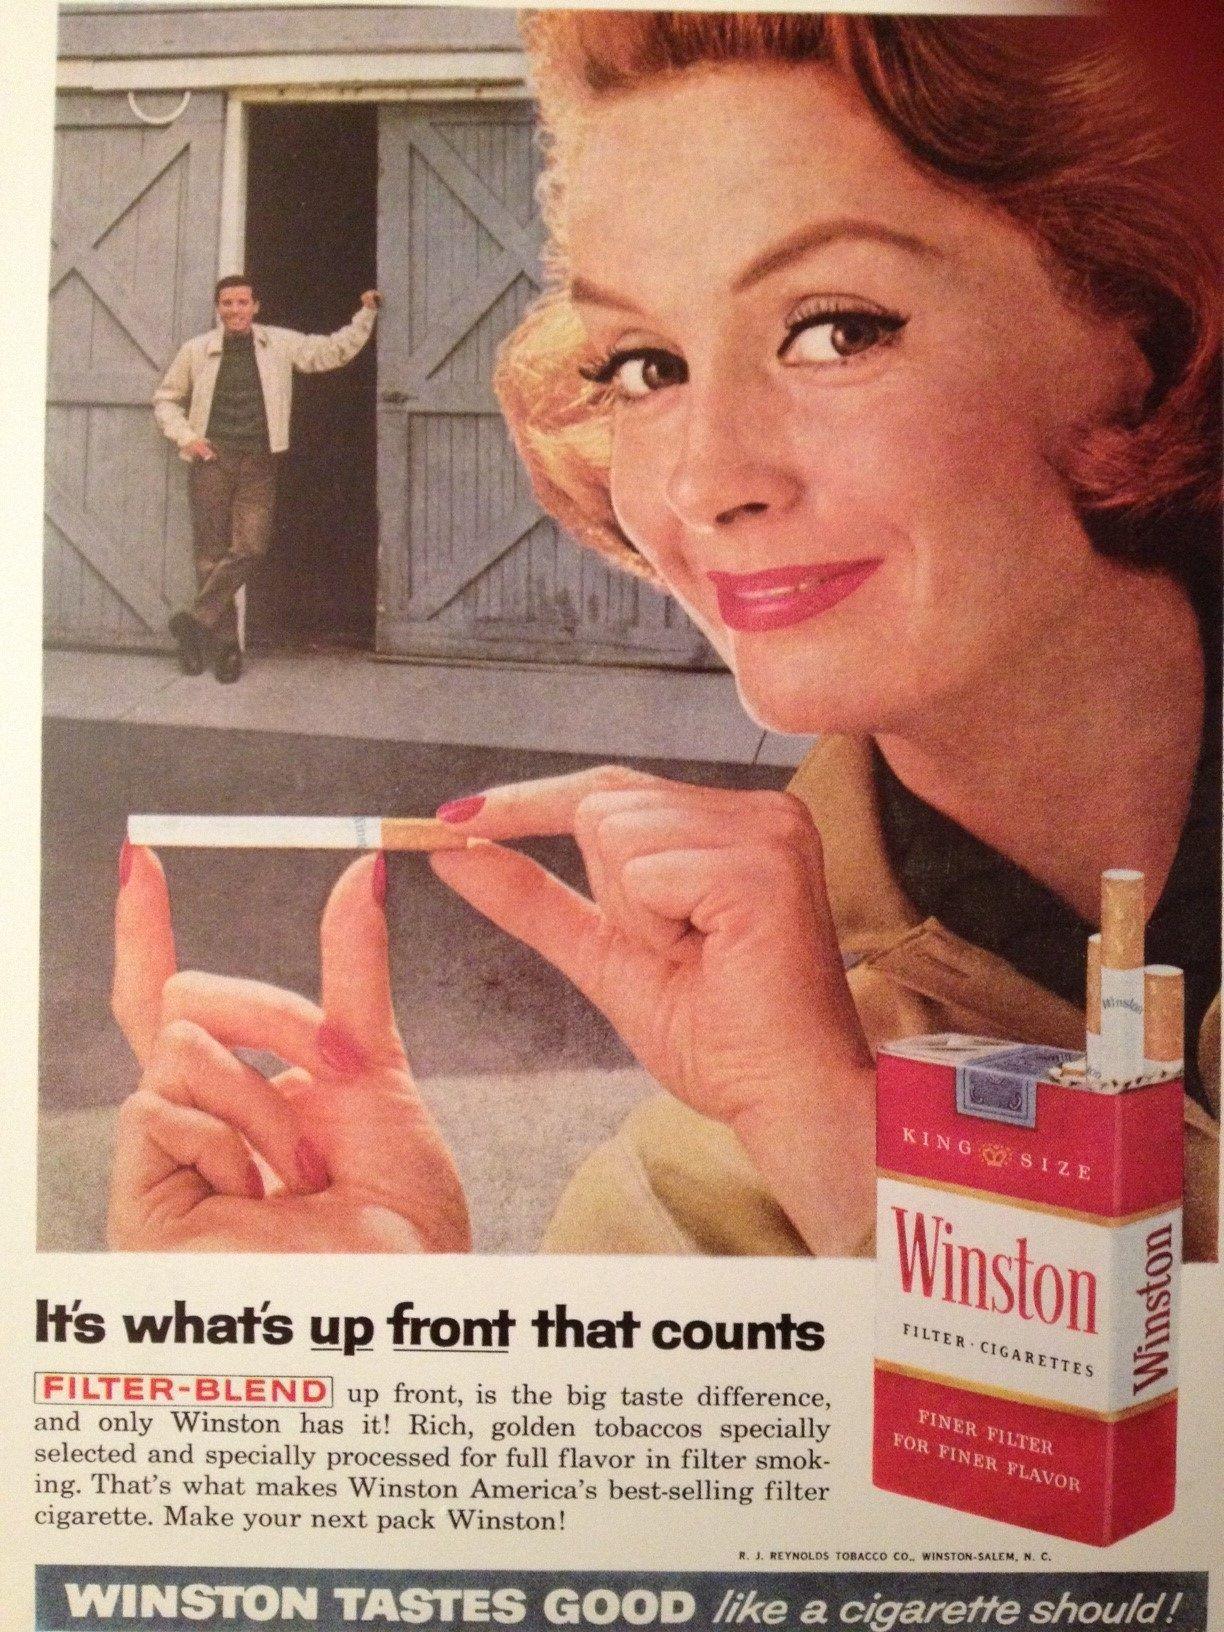 Sexual innuendo sells   Vintage adverts   Pinterest